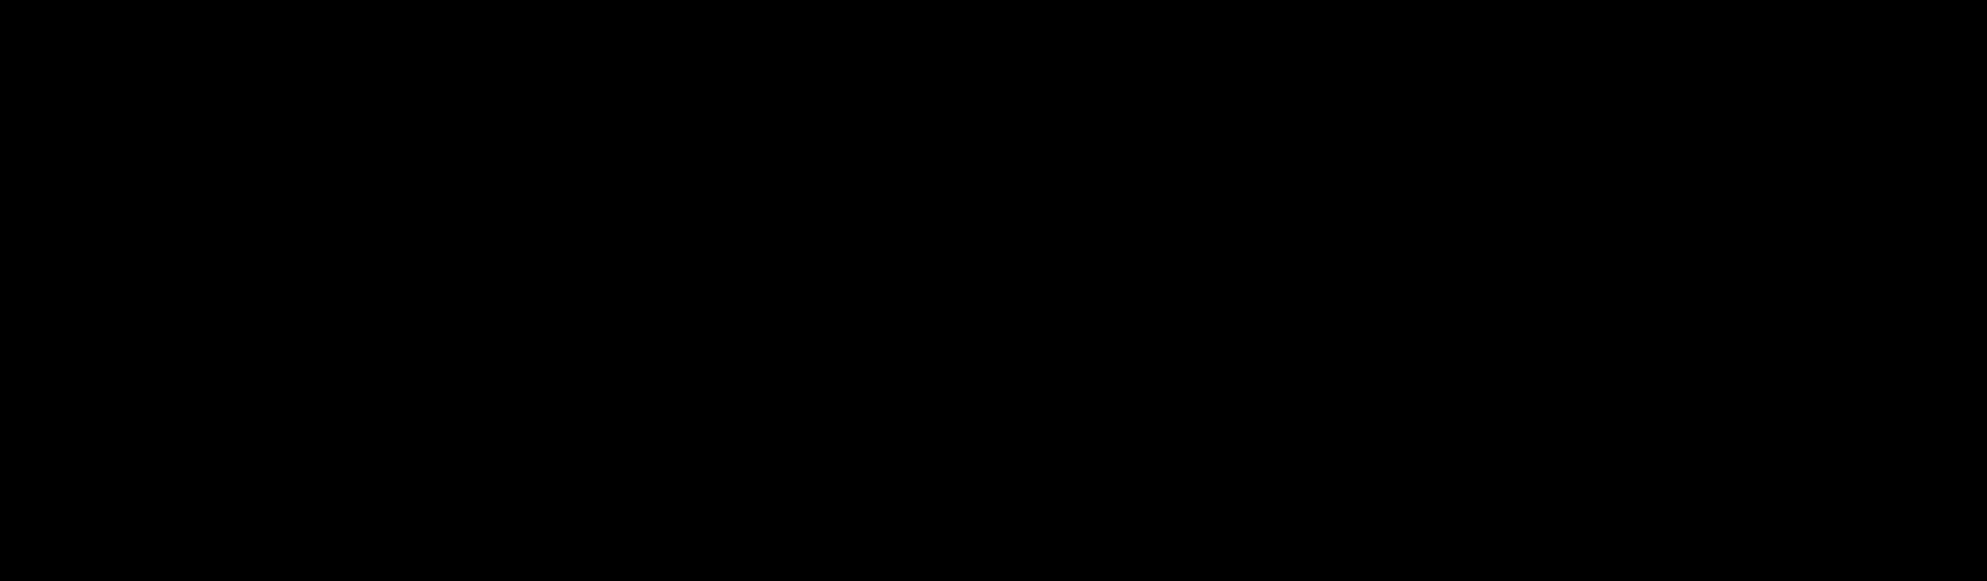 ROB_logo_discr_black